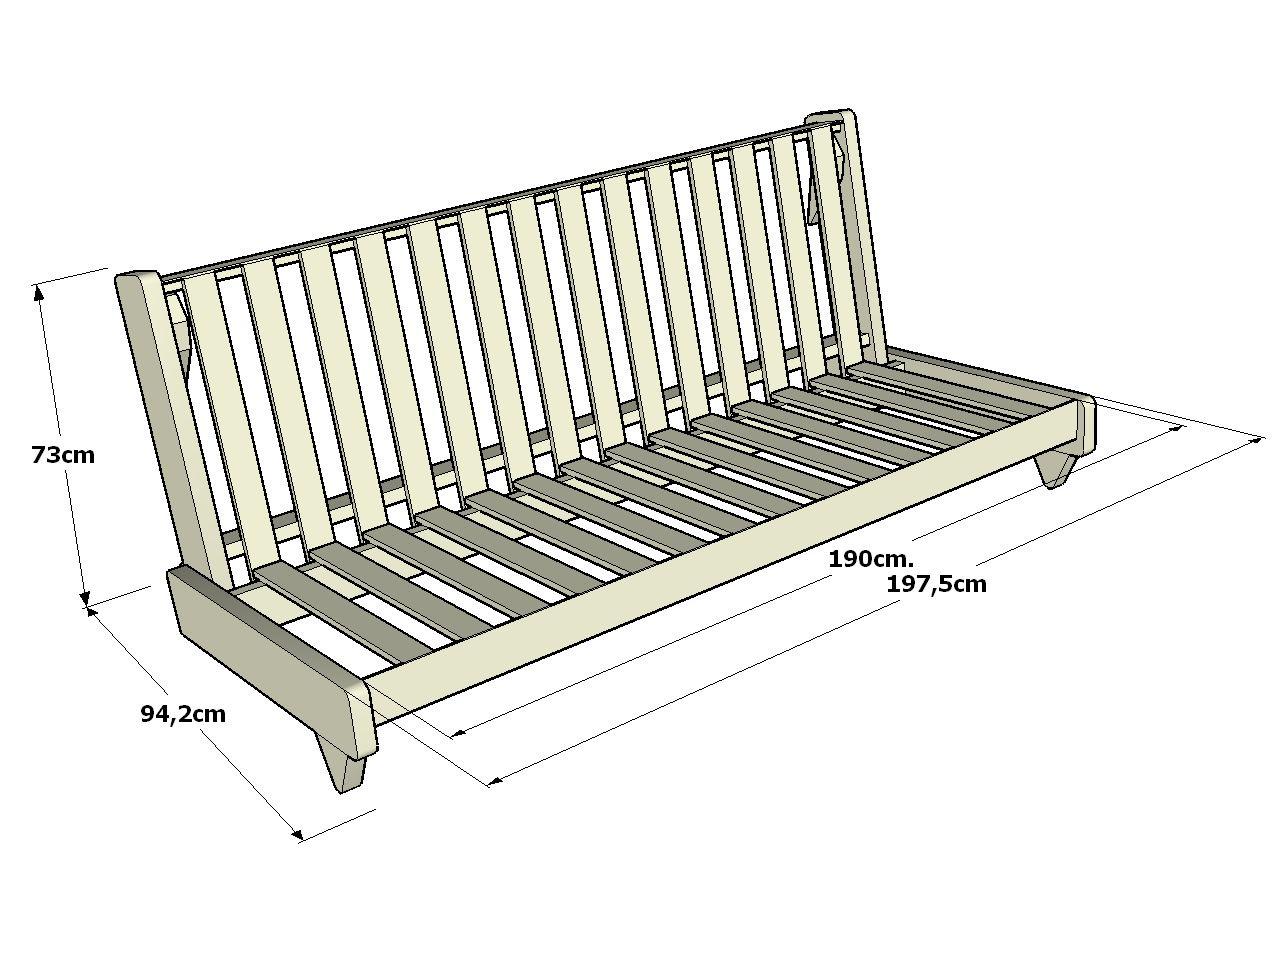 Futon sof cama fresh la estructura del futon sof cama - Sofas de madera de pino ...